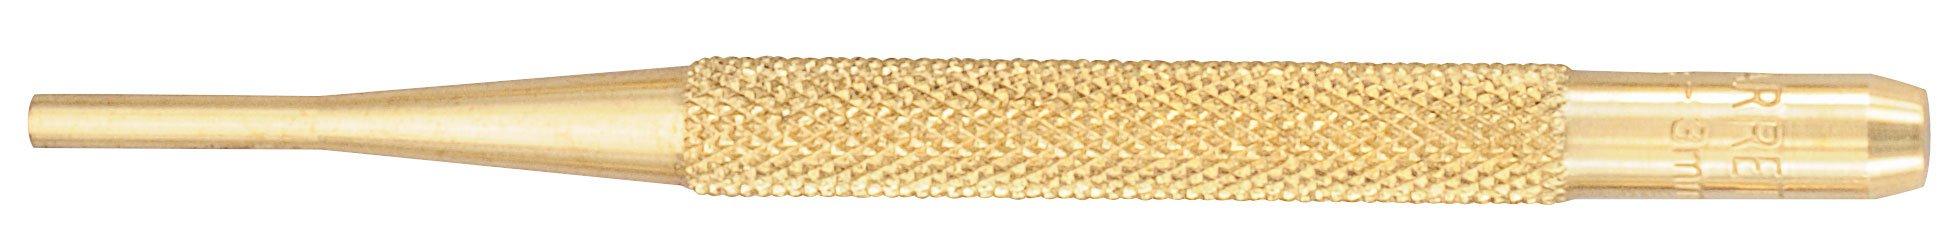 STARRETT Brass Drive Pin Punch,1//8 In Tip,4 In L B565C